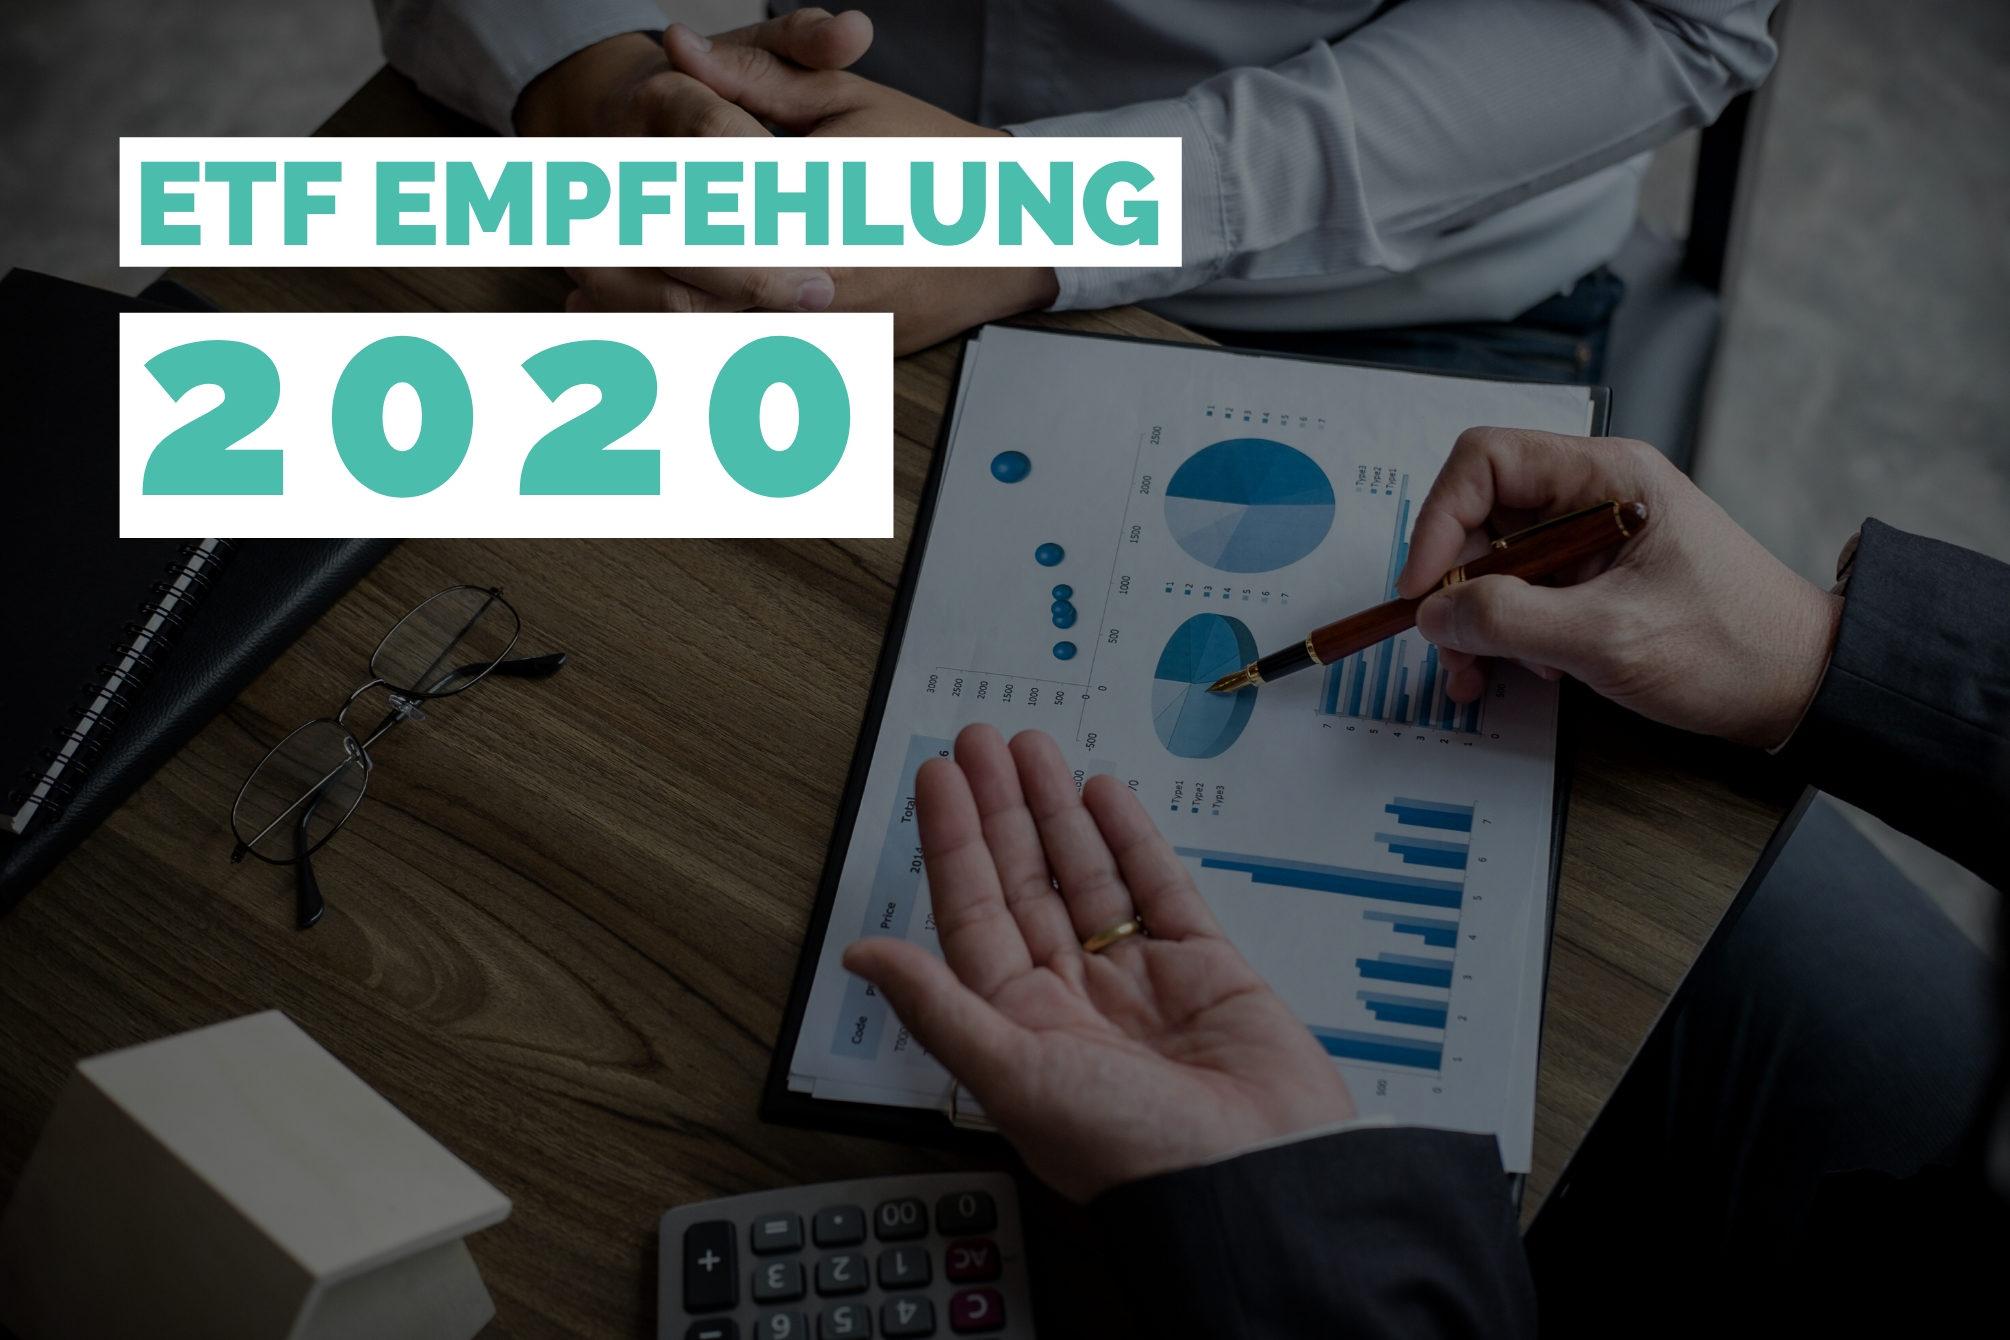 ETF Empfehlung 2020